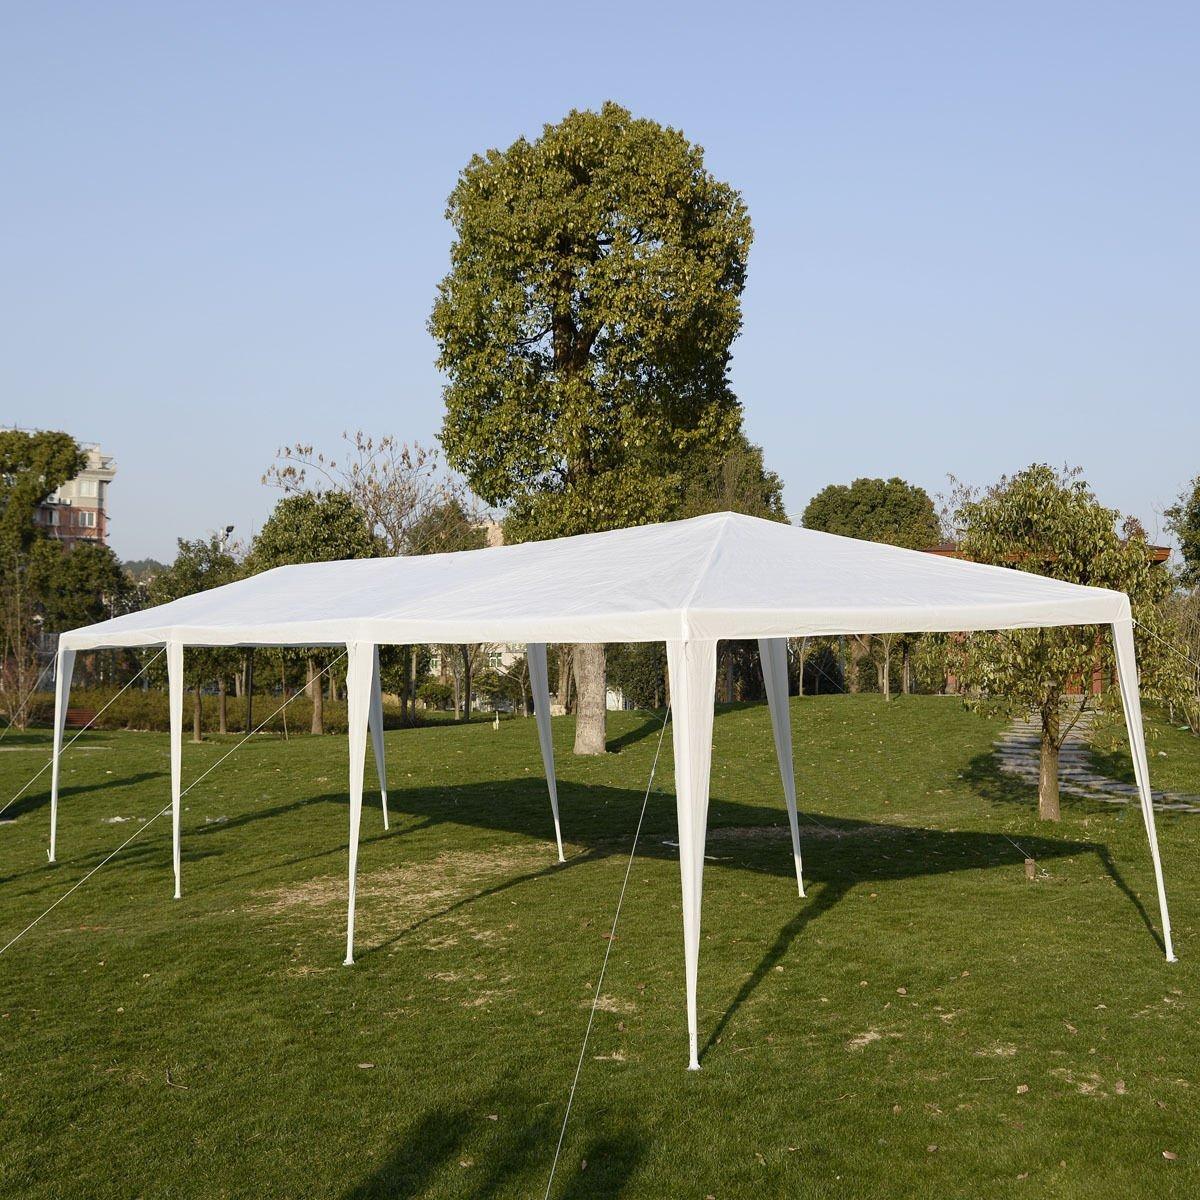 Amazon.com  BenefitUSA Wedding Party Tent Outdoor C&ing 10u0027x30u0027 Easy Set Gazebo BBQ Pavilion Canopy Cater Events  Garden u0026 Outdoor & Amazon.com : BenefitUSA Wedding Party Tent Outdoor Camping 10u0027x30 ...